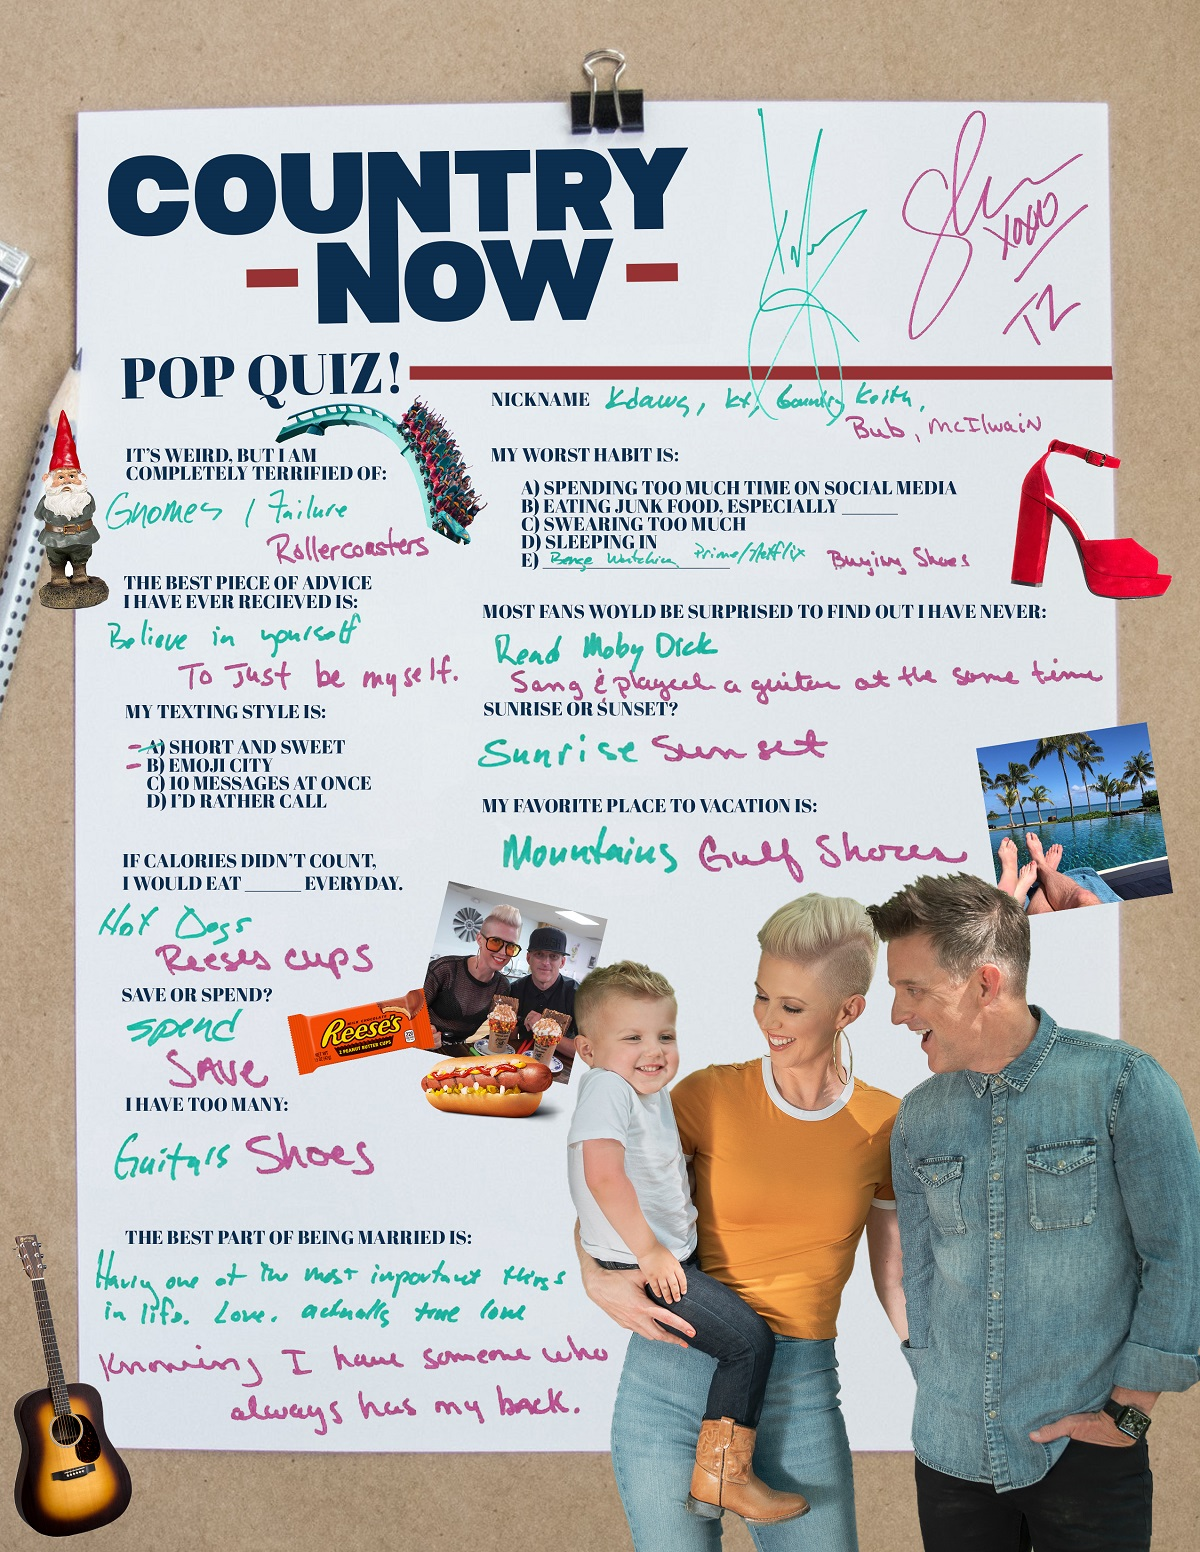 Thompson Square; Country Now Pop Quiz